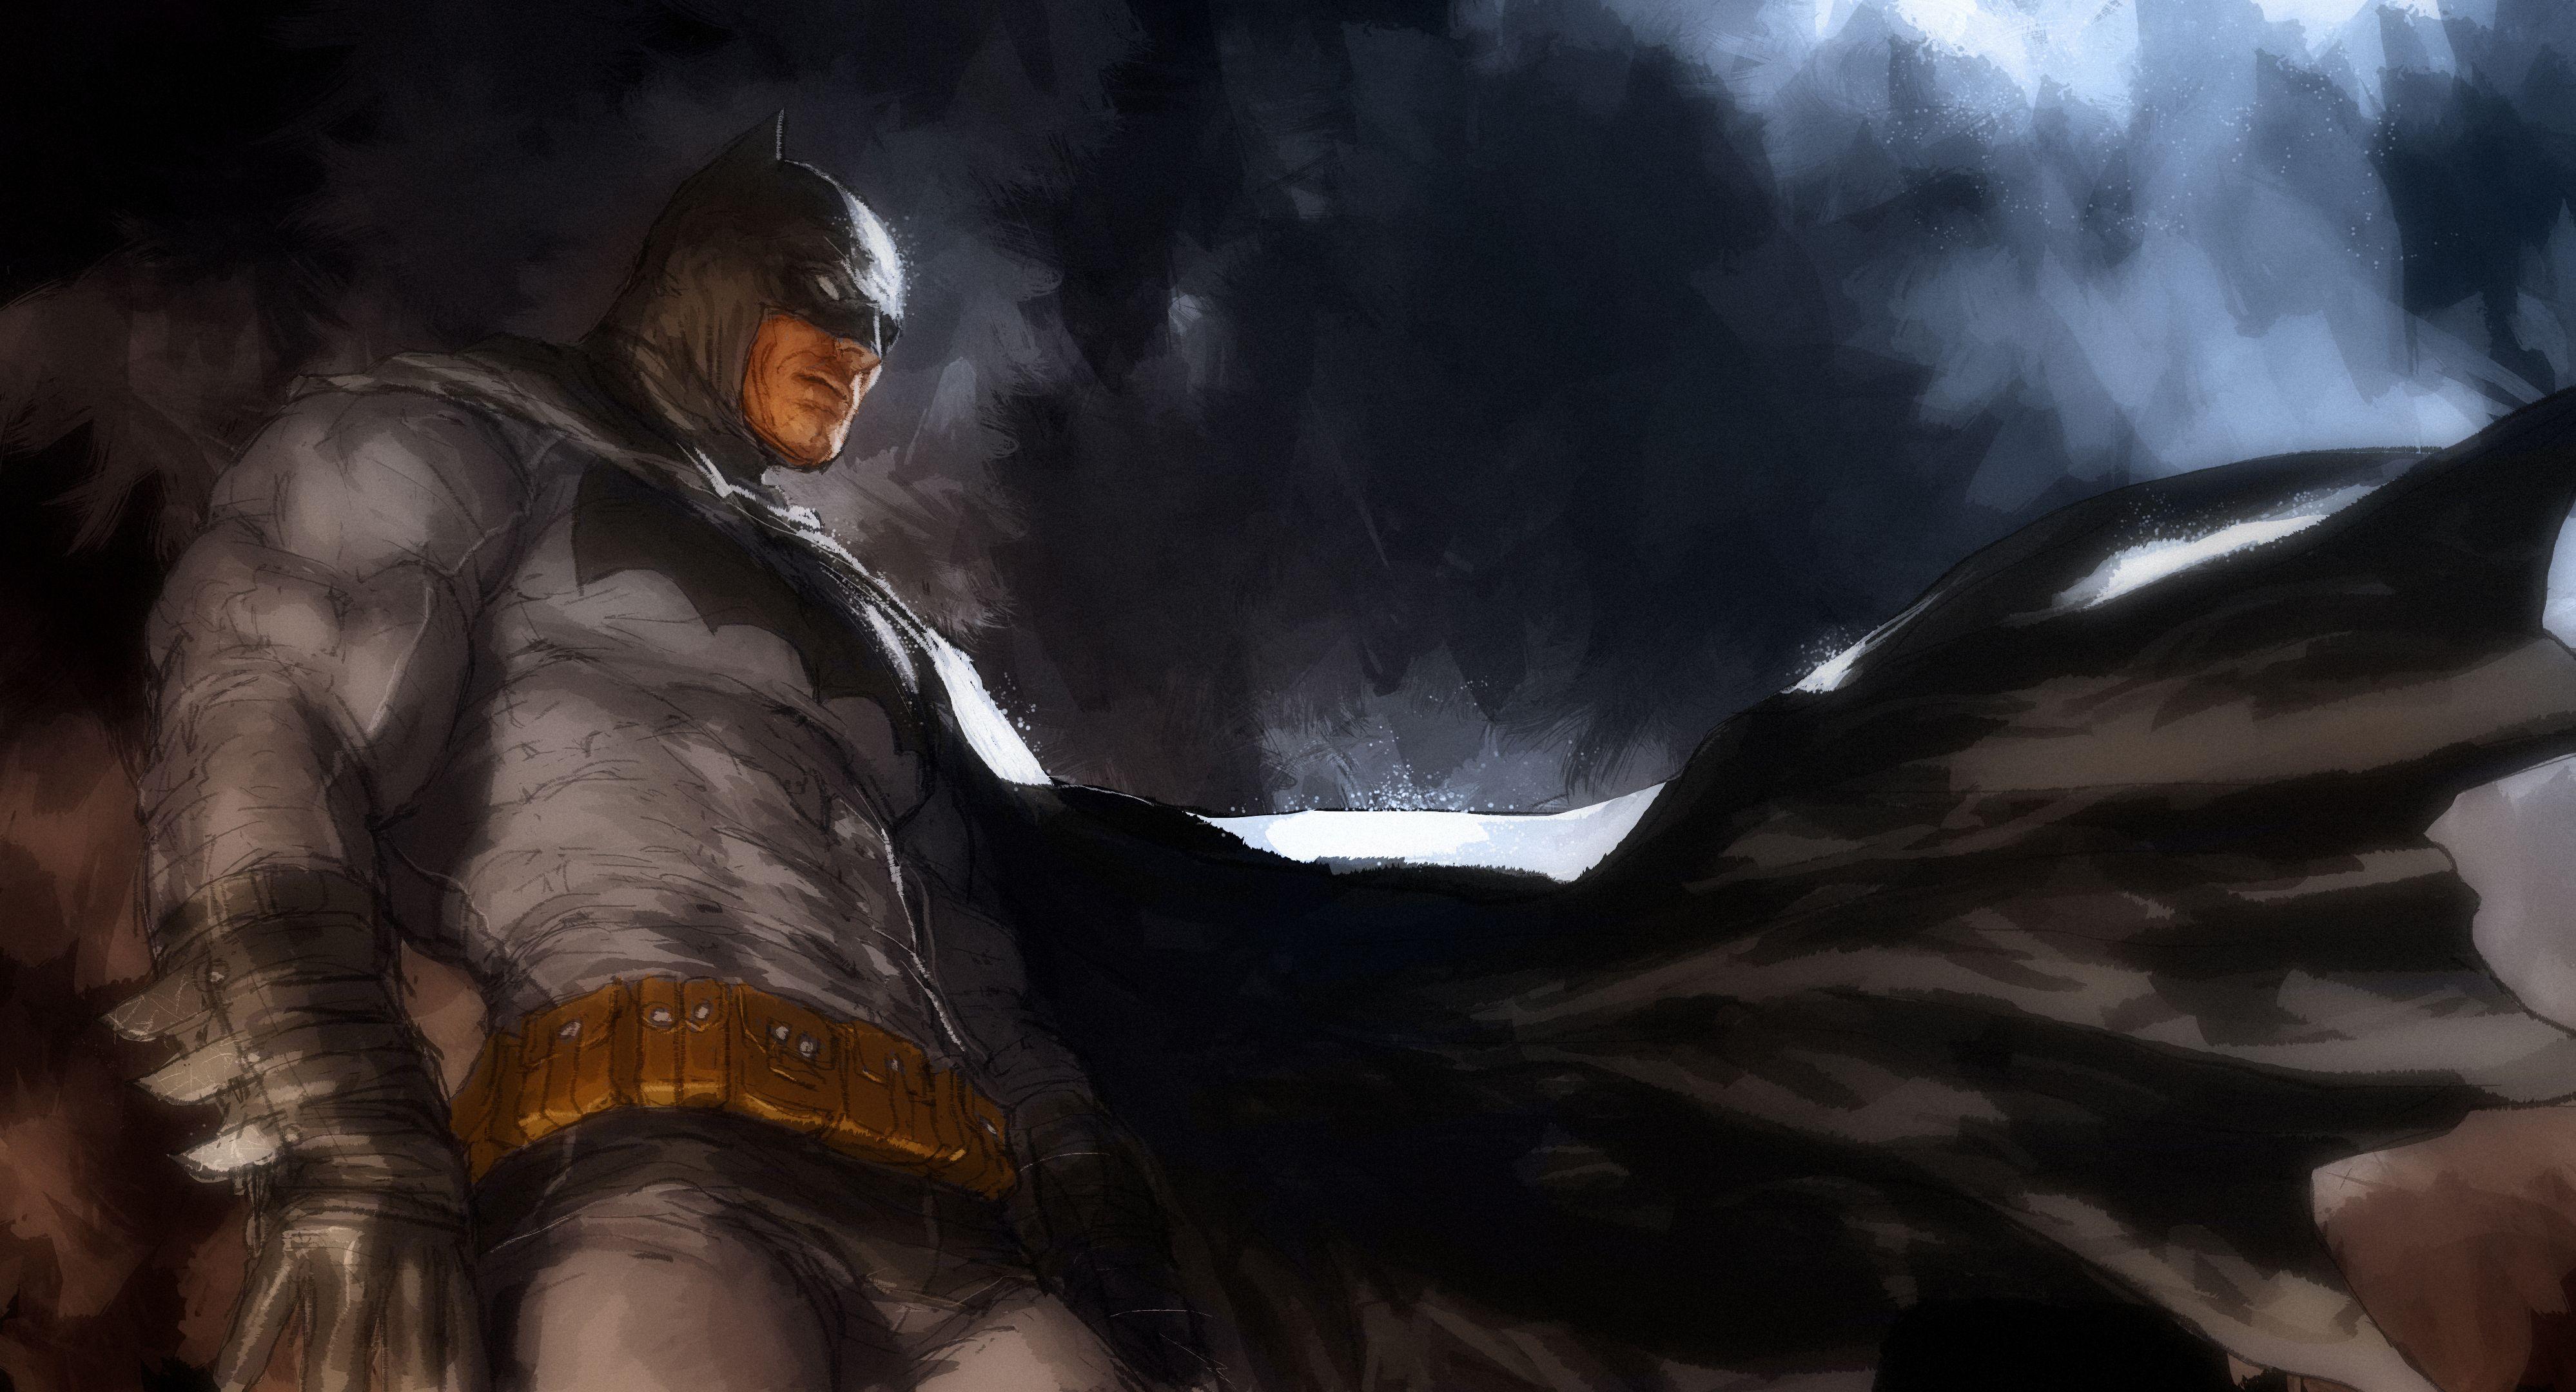 Batman Hero Men Cloak Superhero Dark Knight Wallpaper 3996x2160